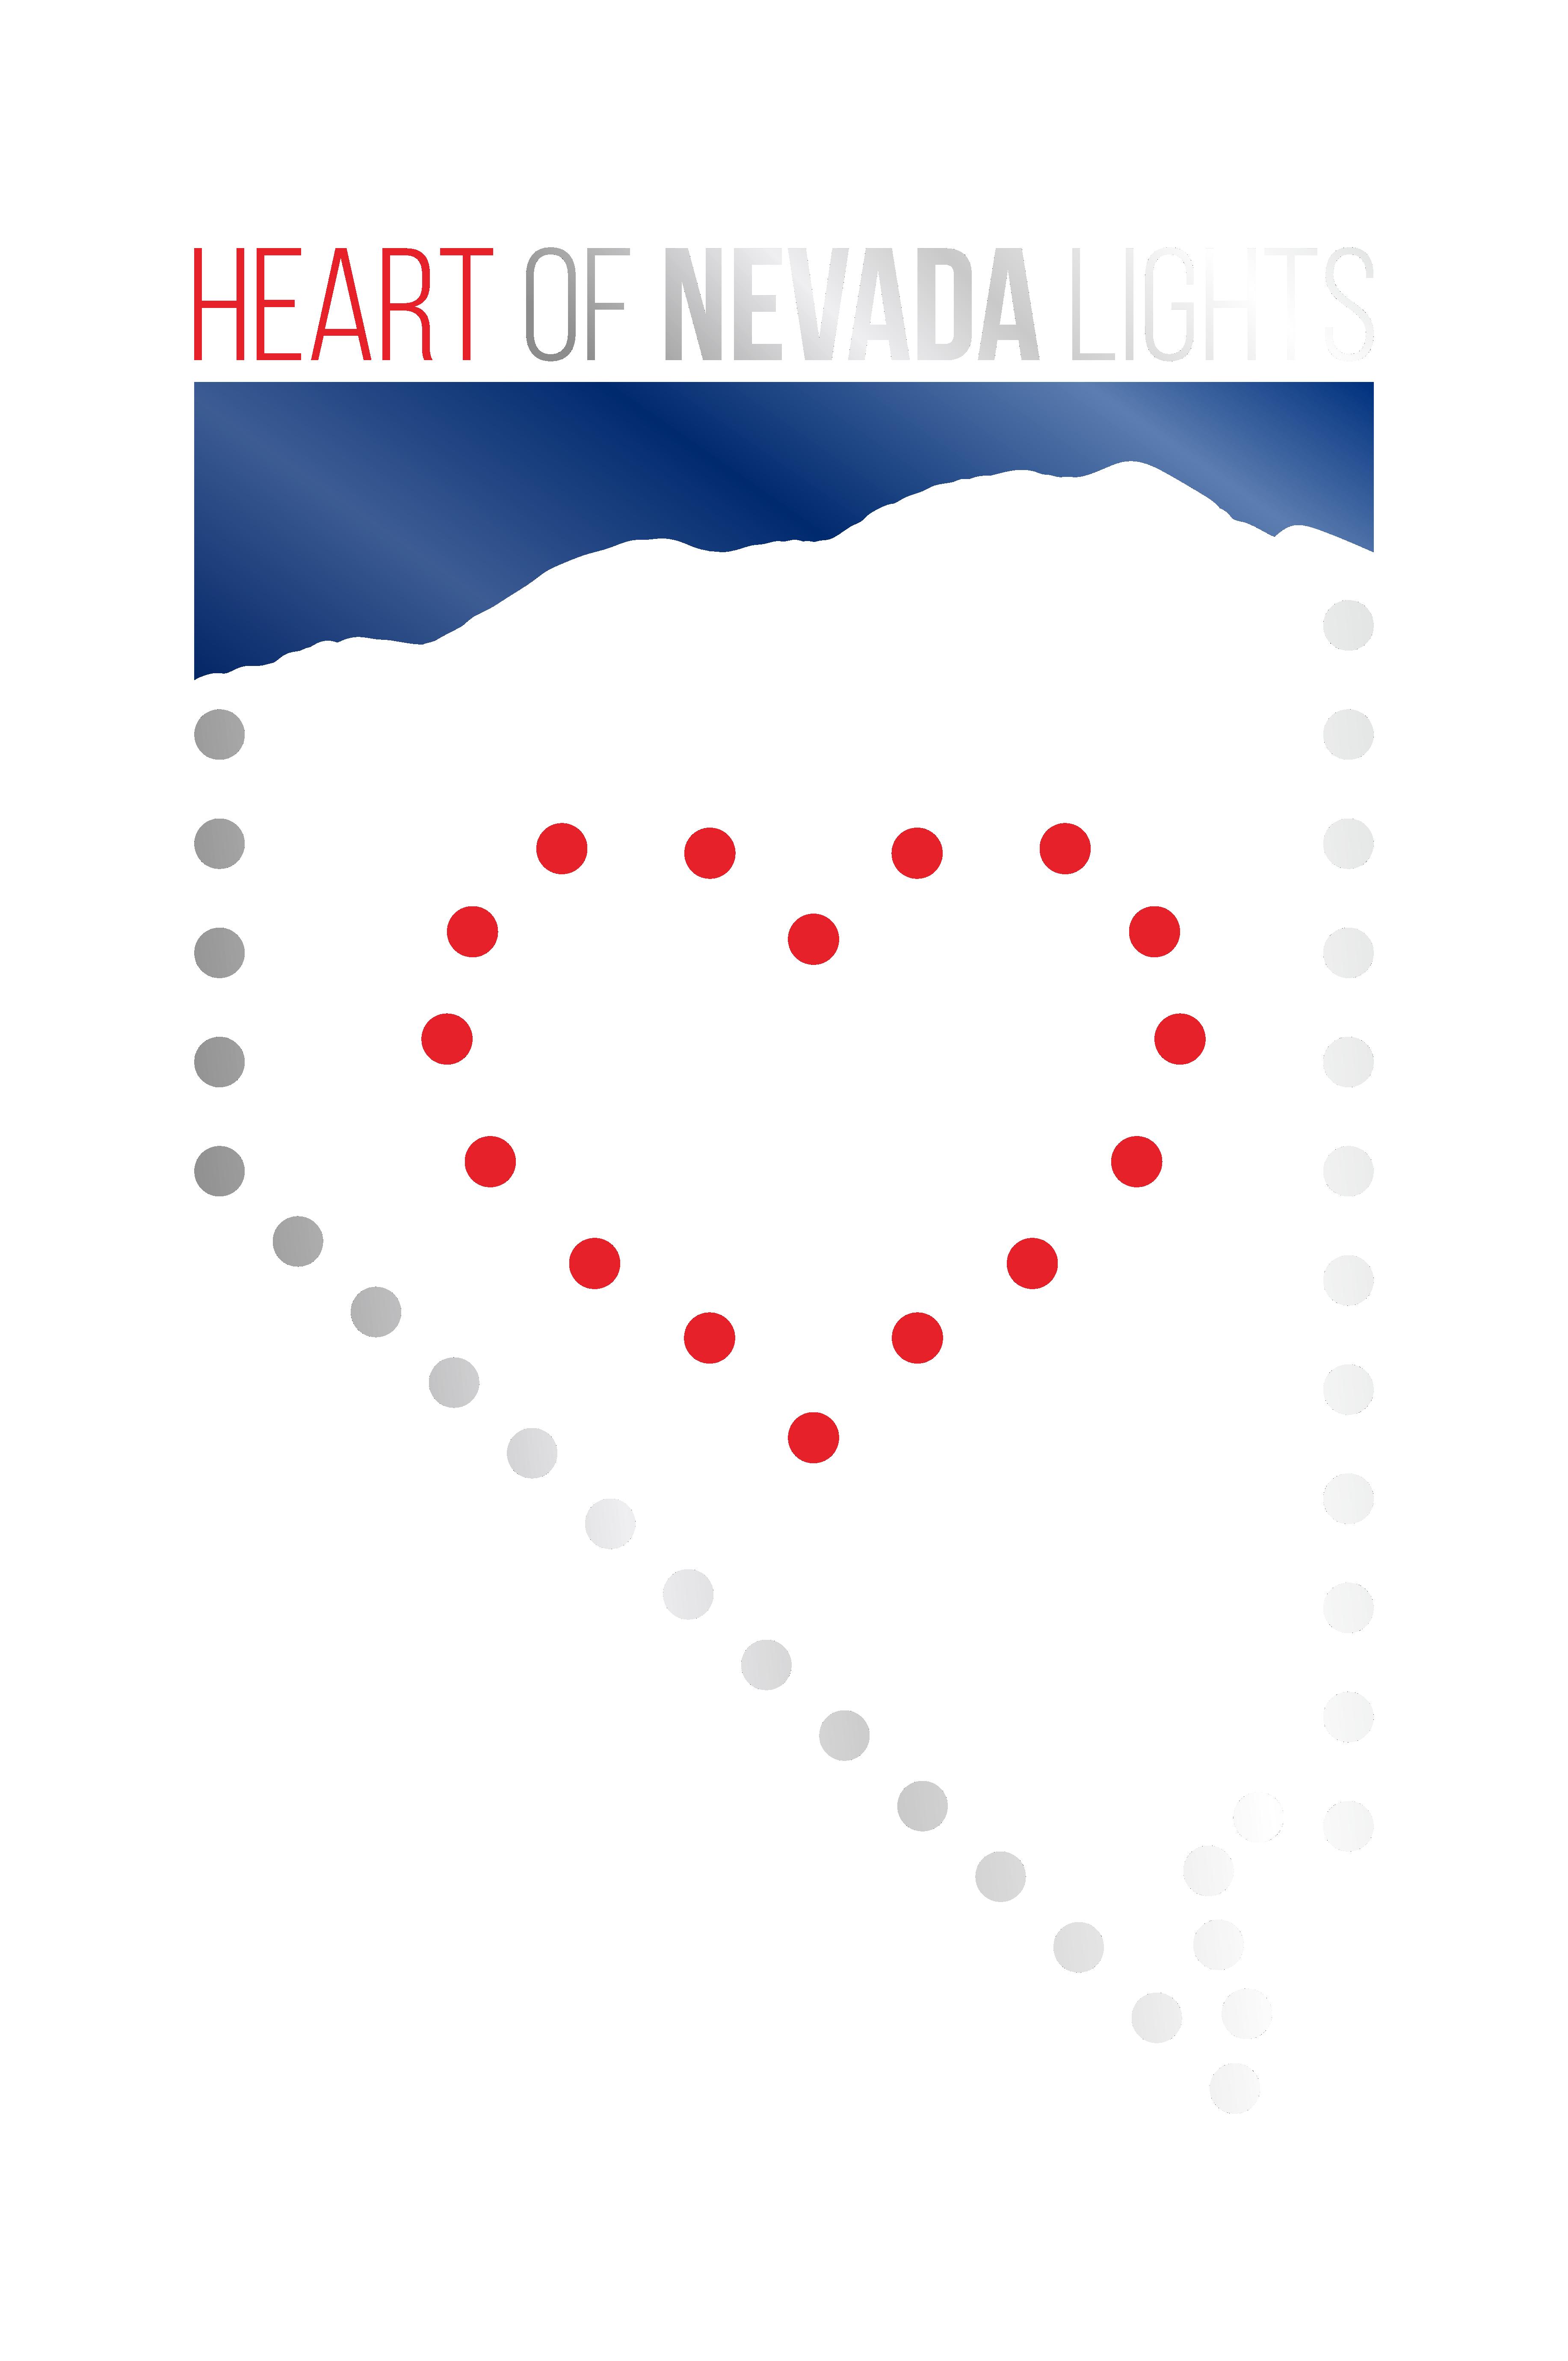 Heart of Nevada Lights